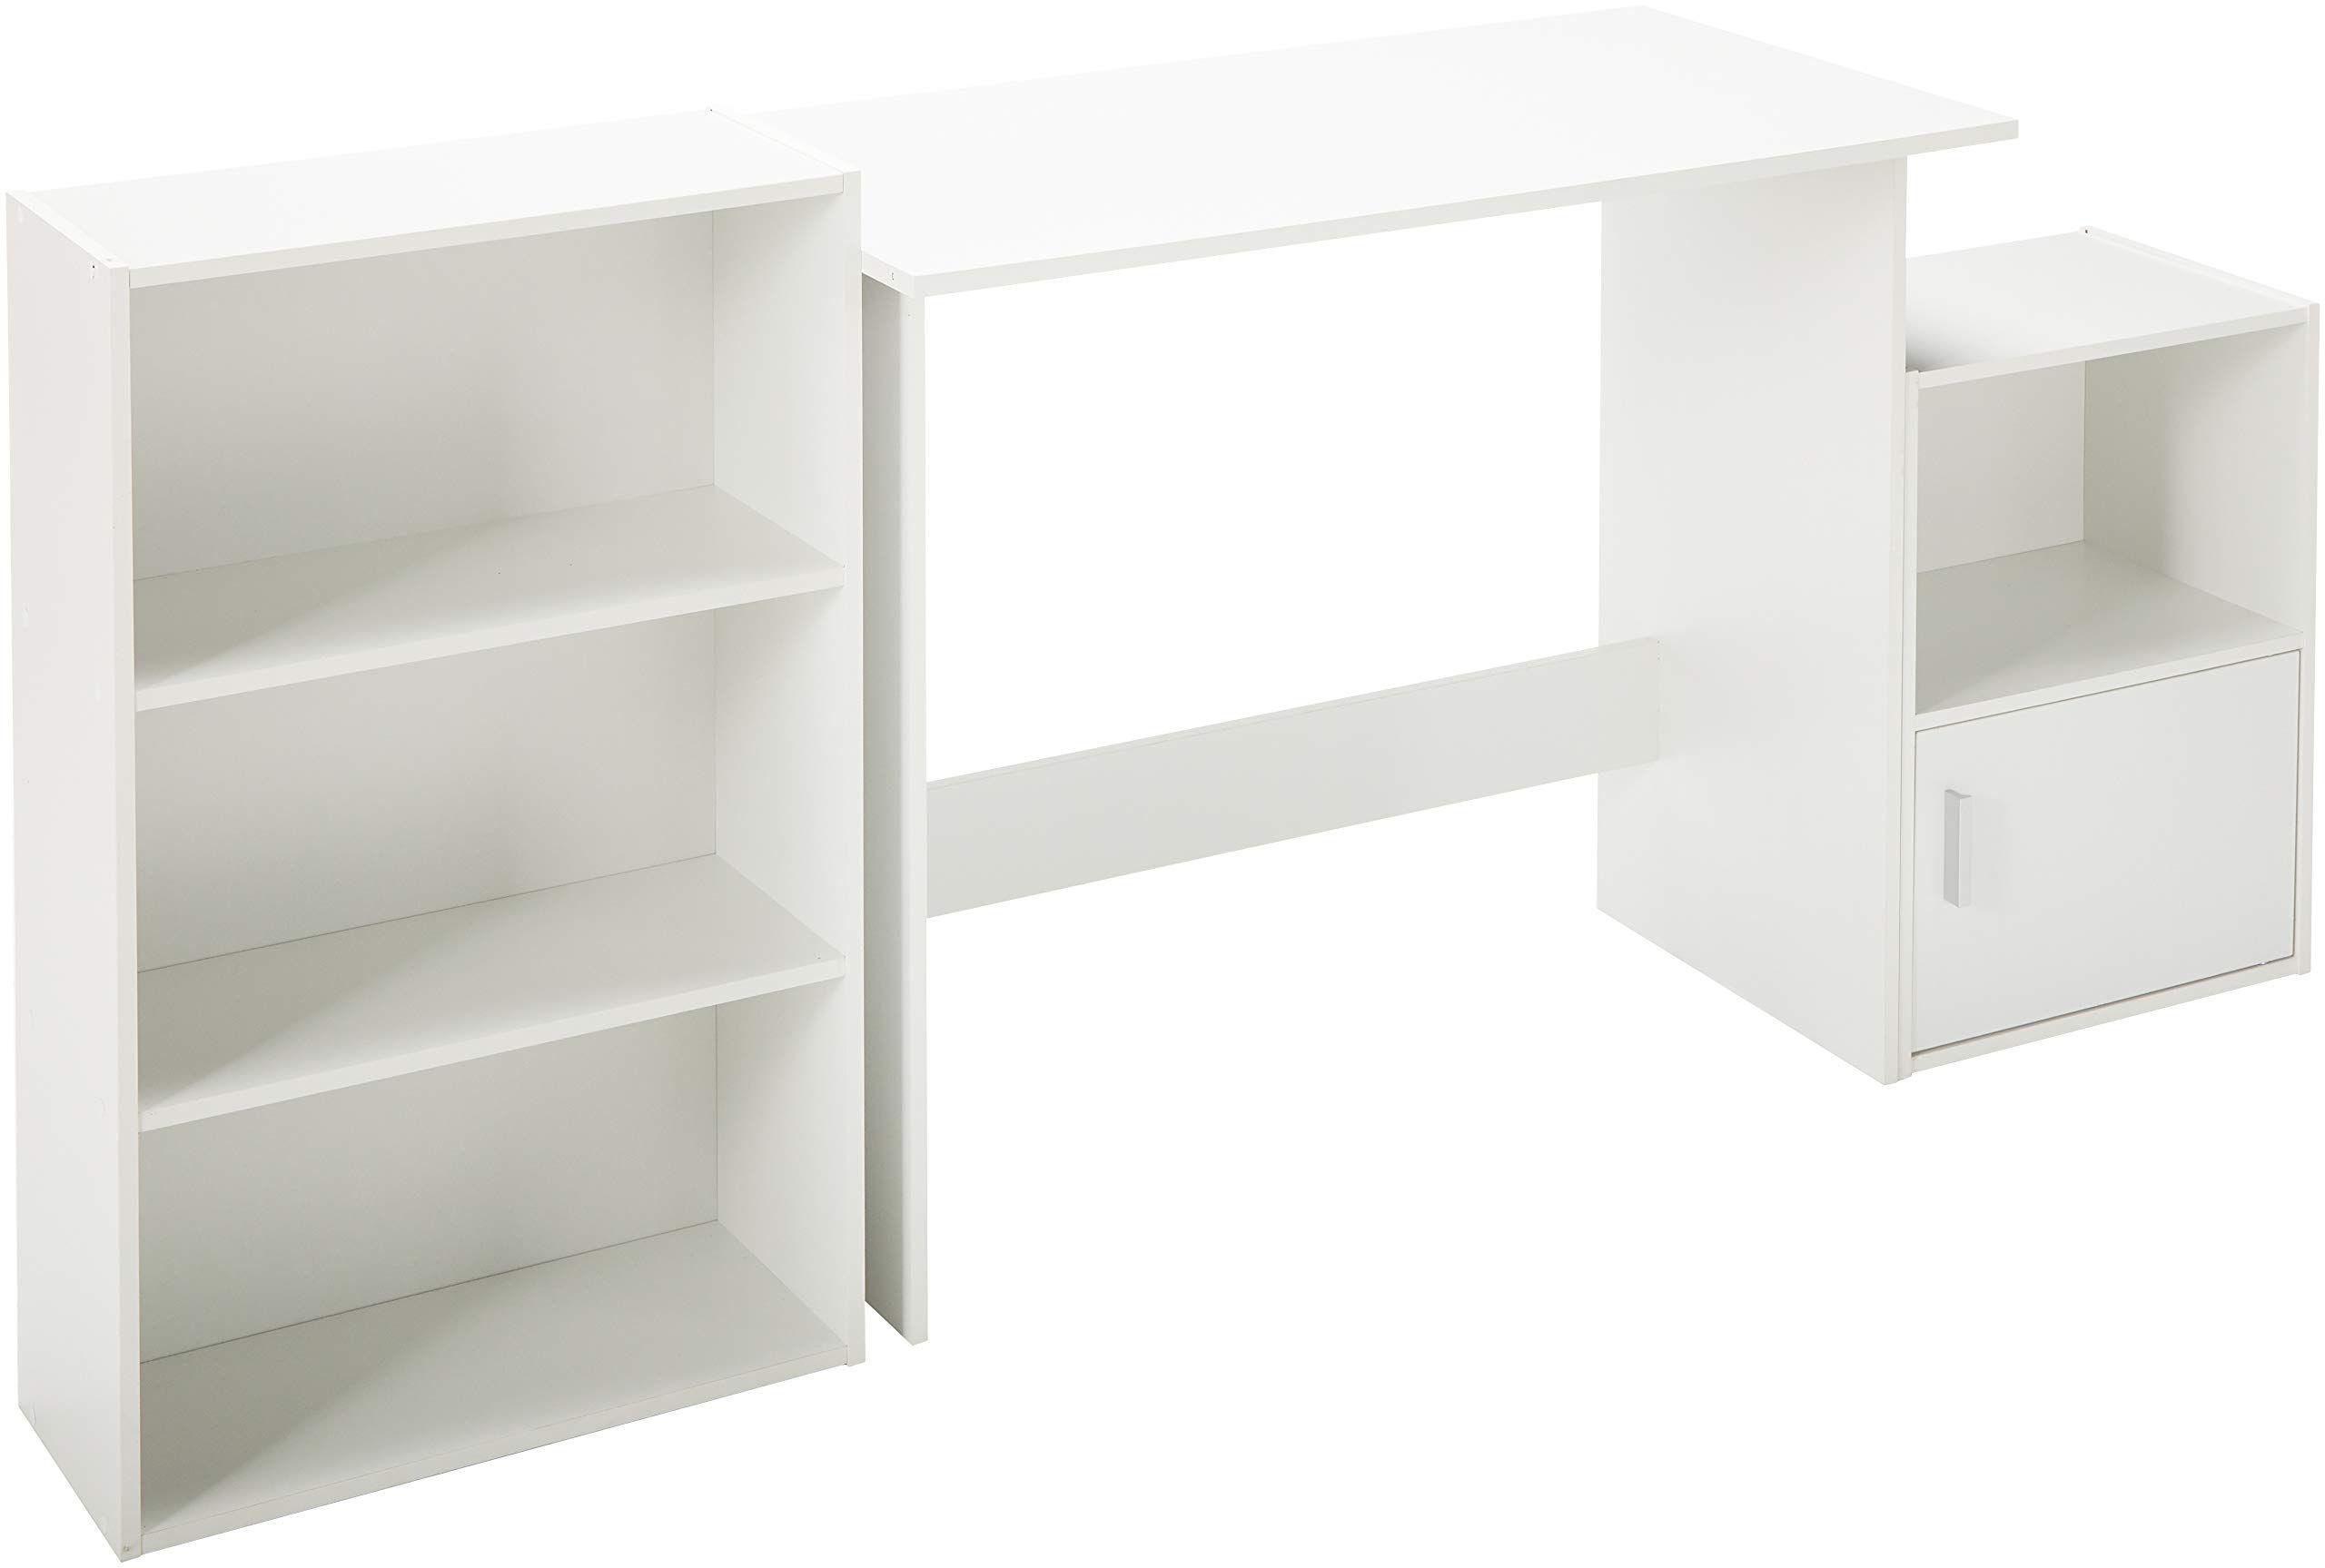 Target Marketing Systems 3 Piece Soho Study Set With 1 Writing Desk 1 3 Shelf Bookcase And 1 Storage Cube White Mor In 2020 Bookcase Cube Storage 3 Shelf Bookcase